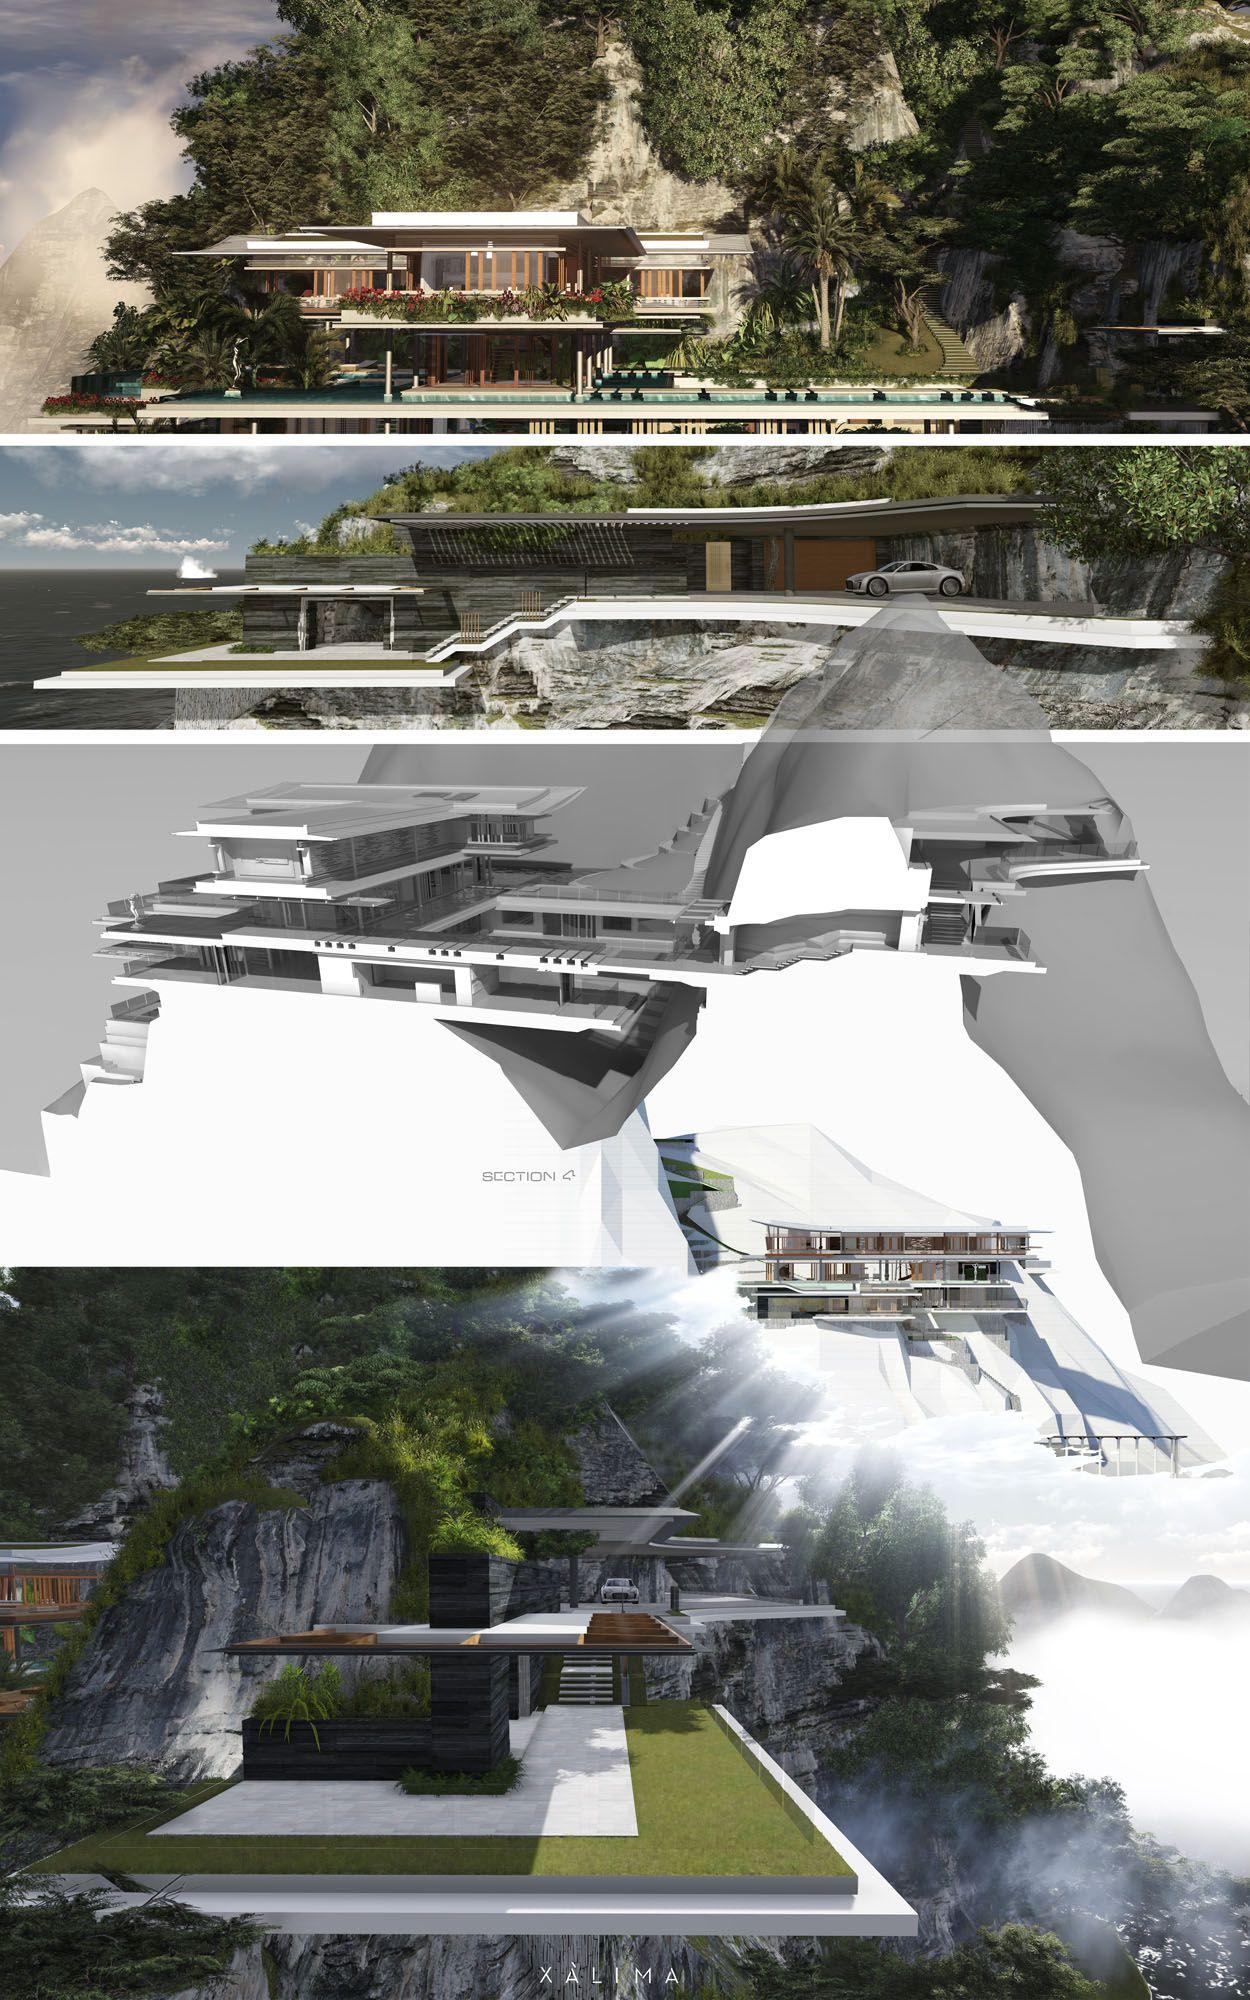 Xalima xálima island housemartin ferrero architecture | architecture